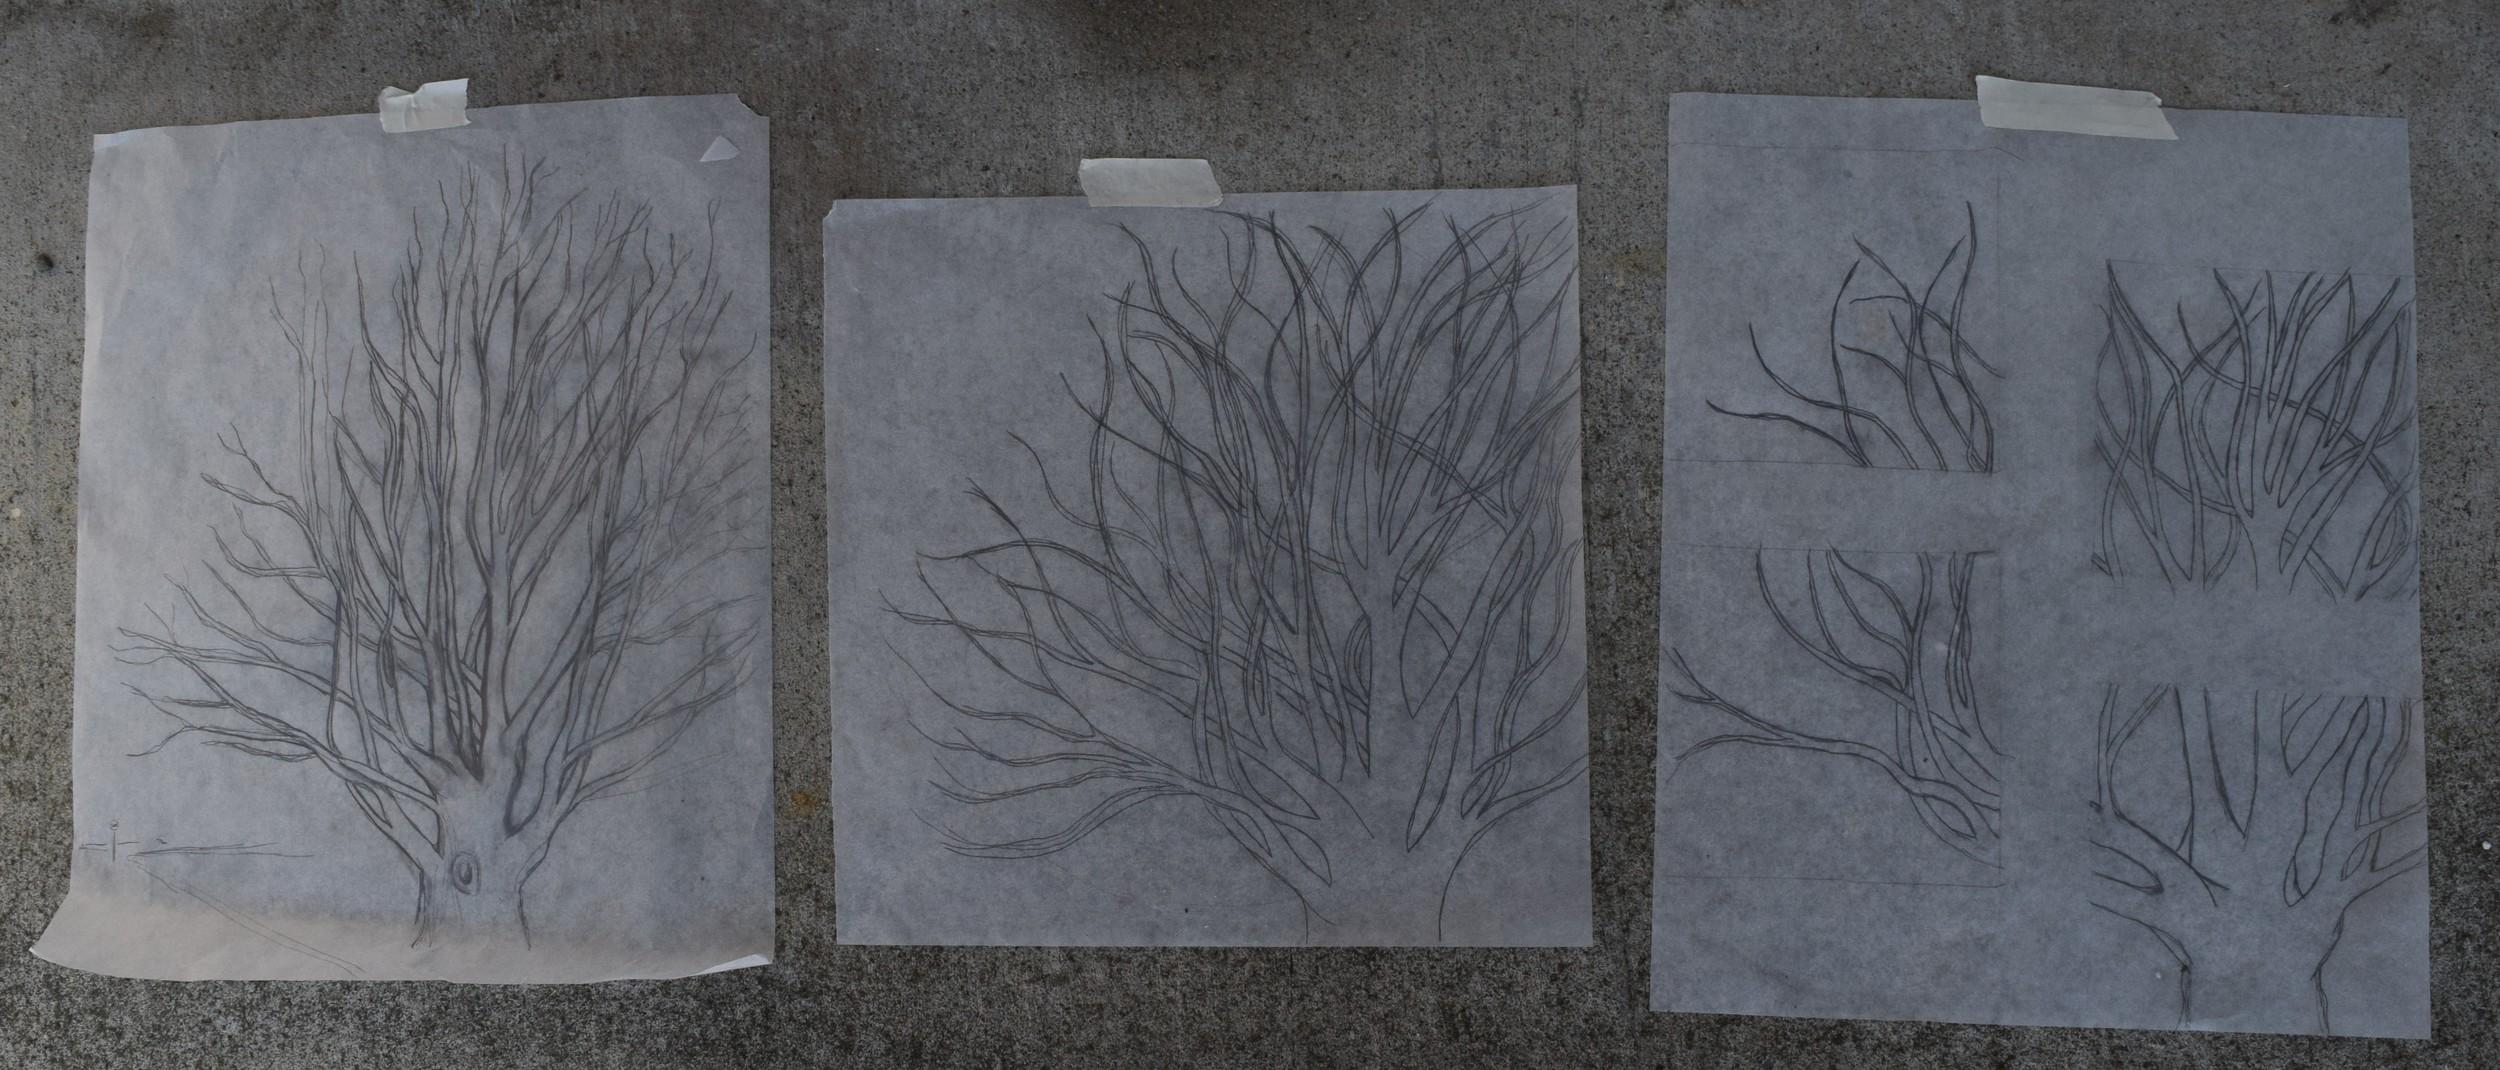 Figure 2: Progression of the tree sketch.